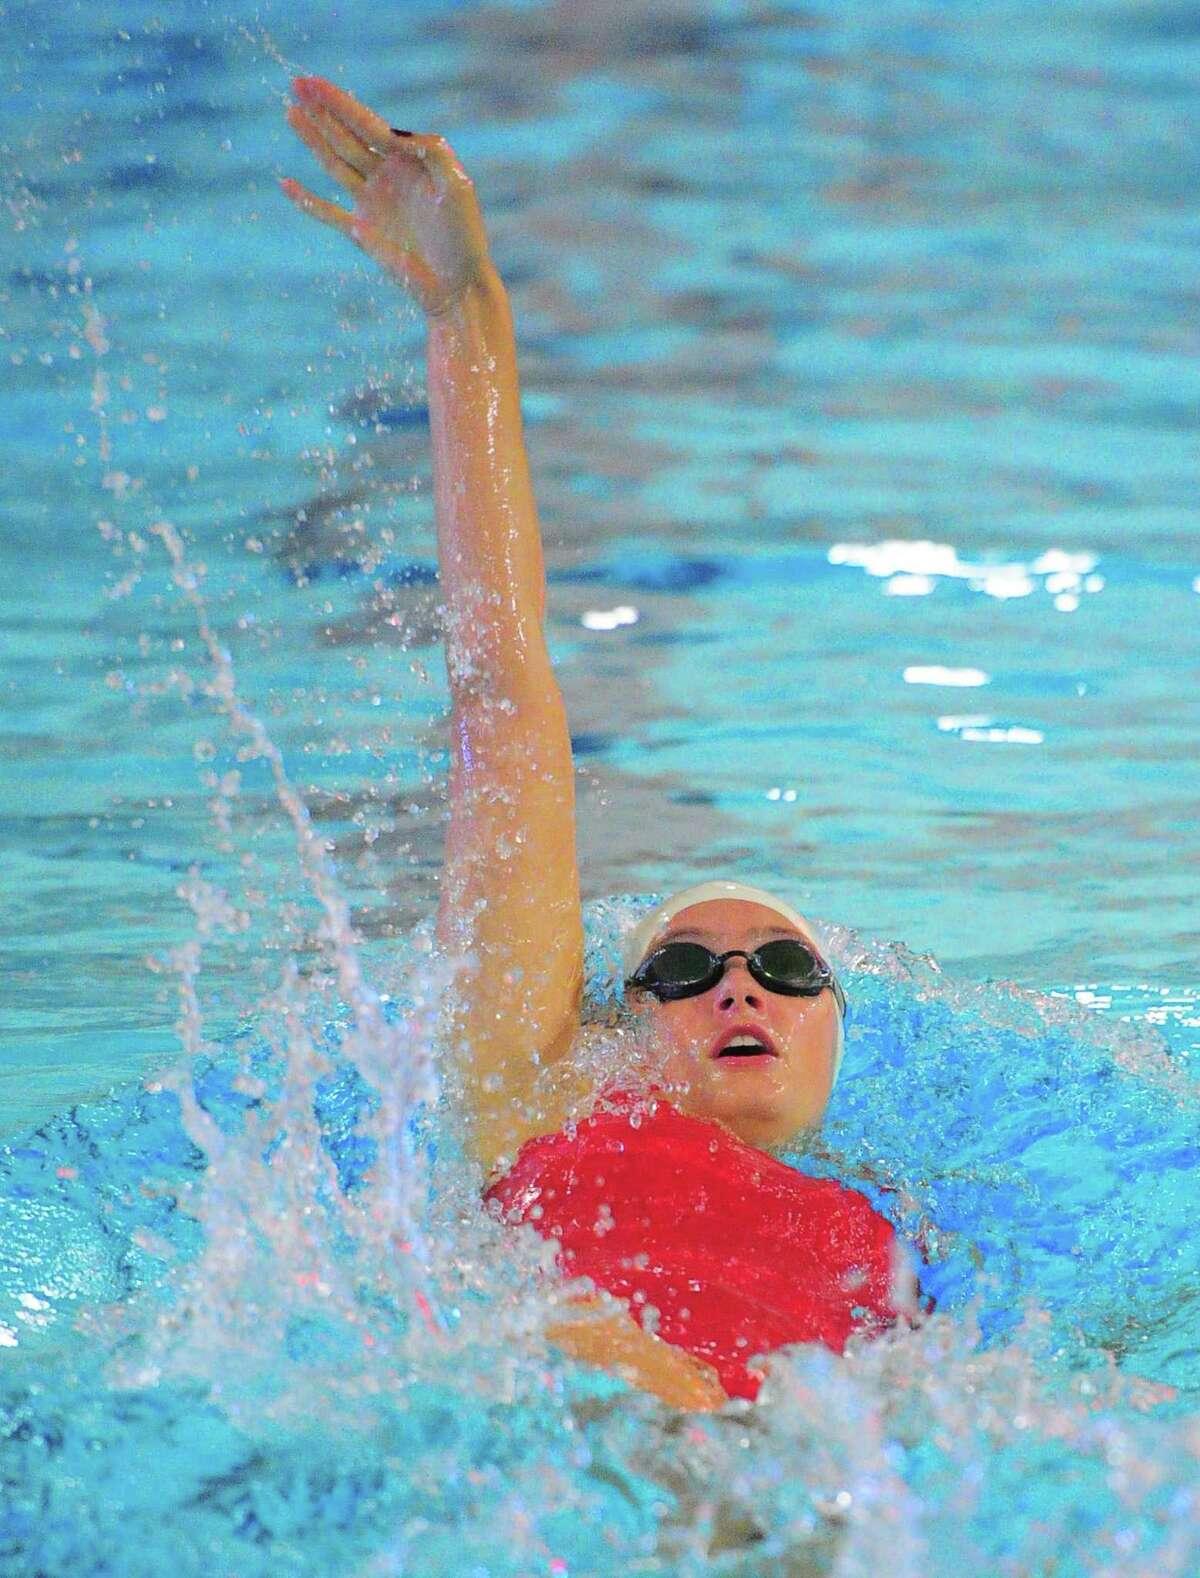 Greenwich's Samantha Ennis competes in the 100-meter backstroke against Ridgefield on Sept. 18 in Ridgefield.